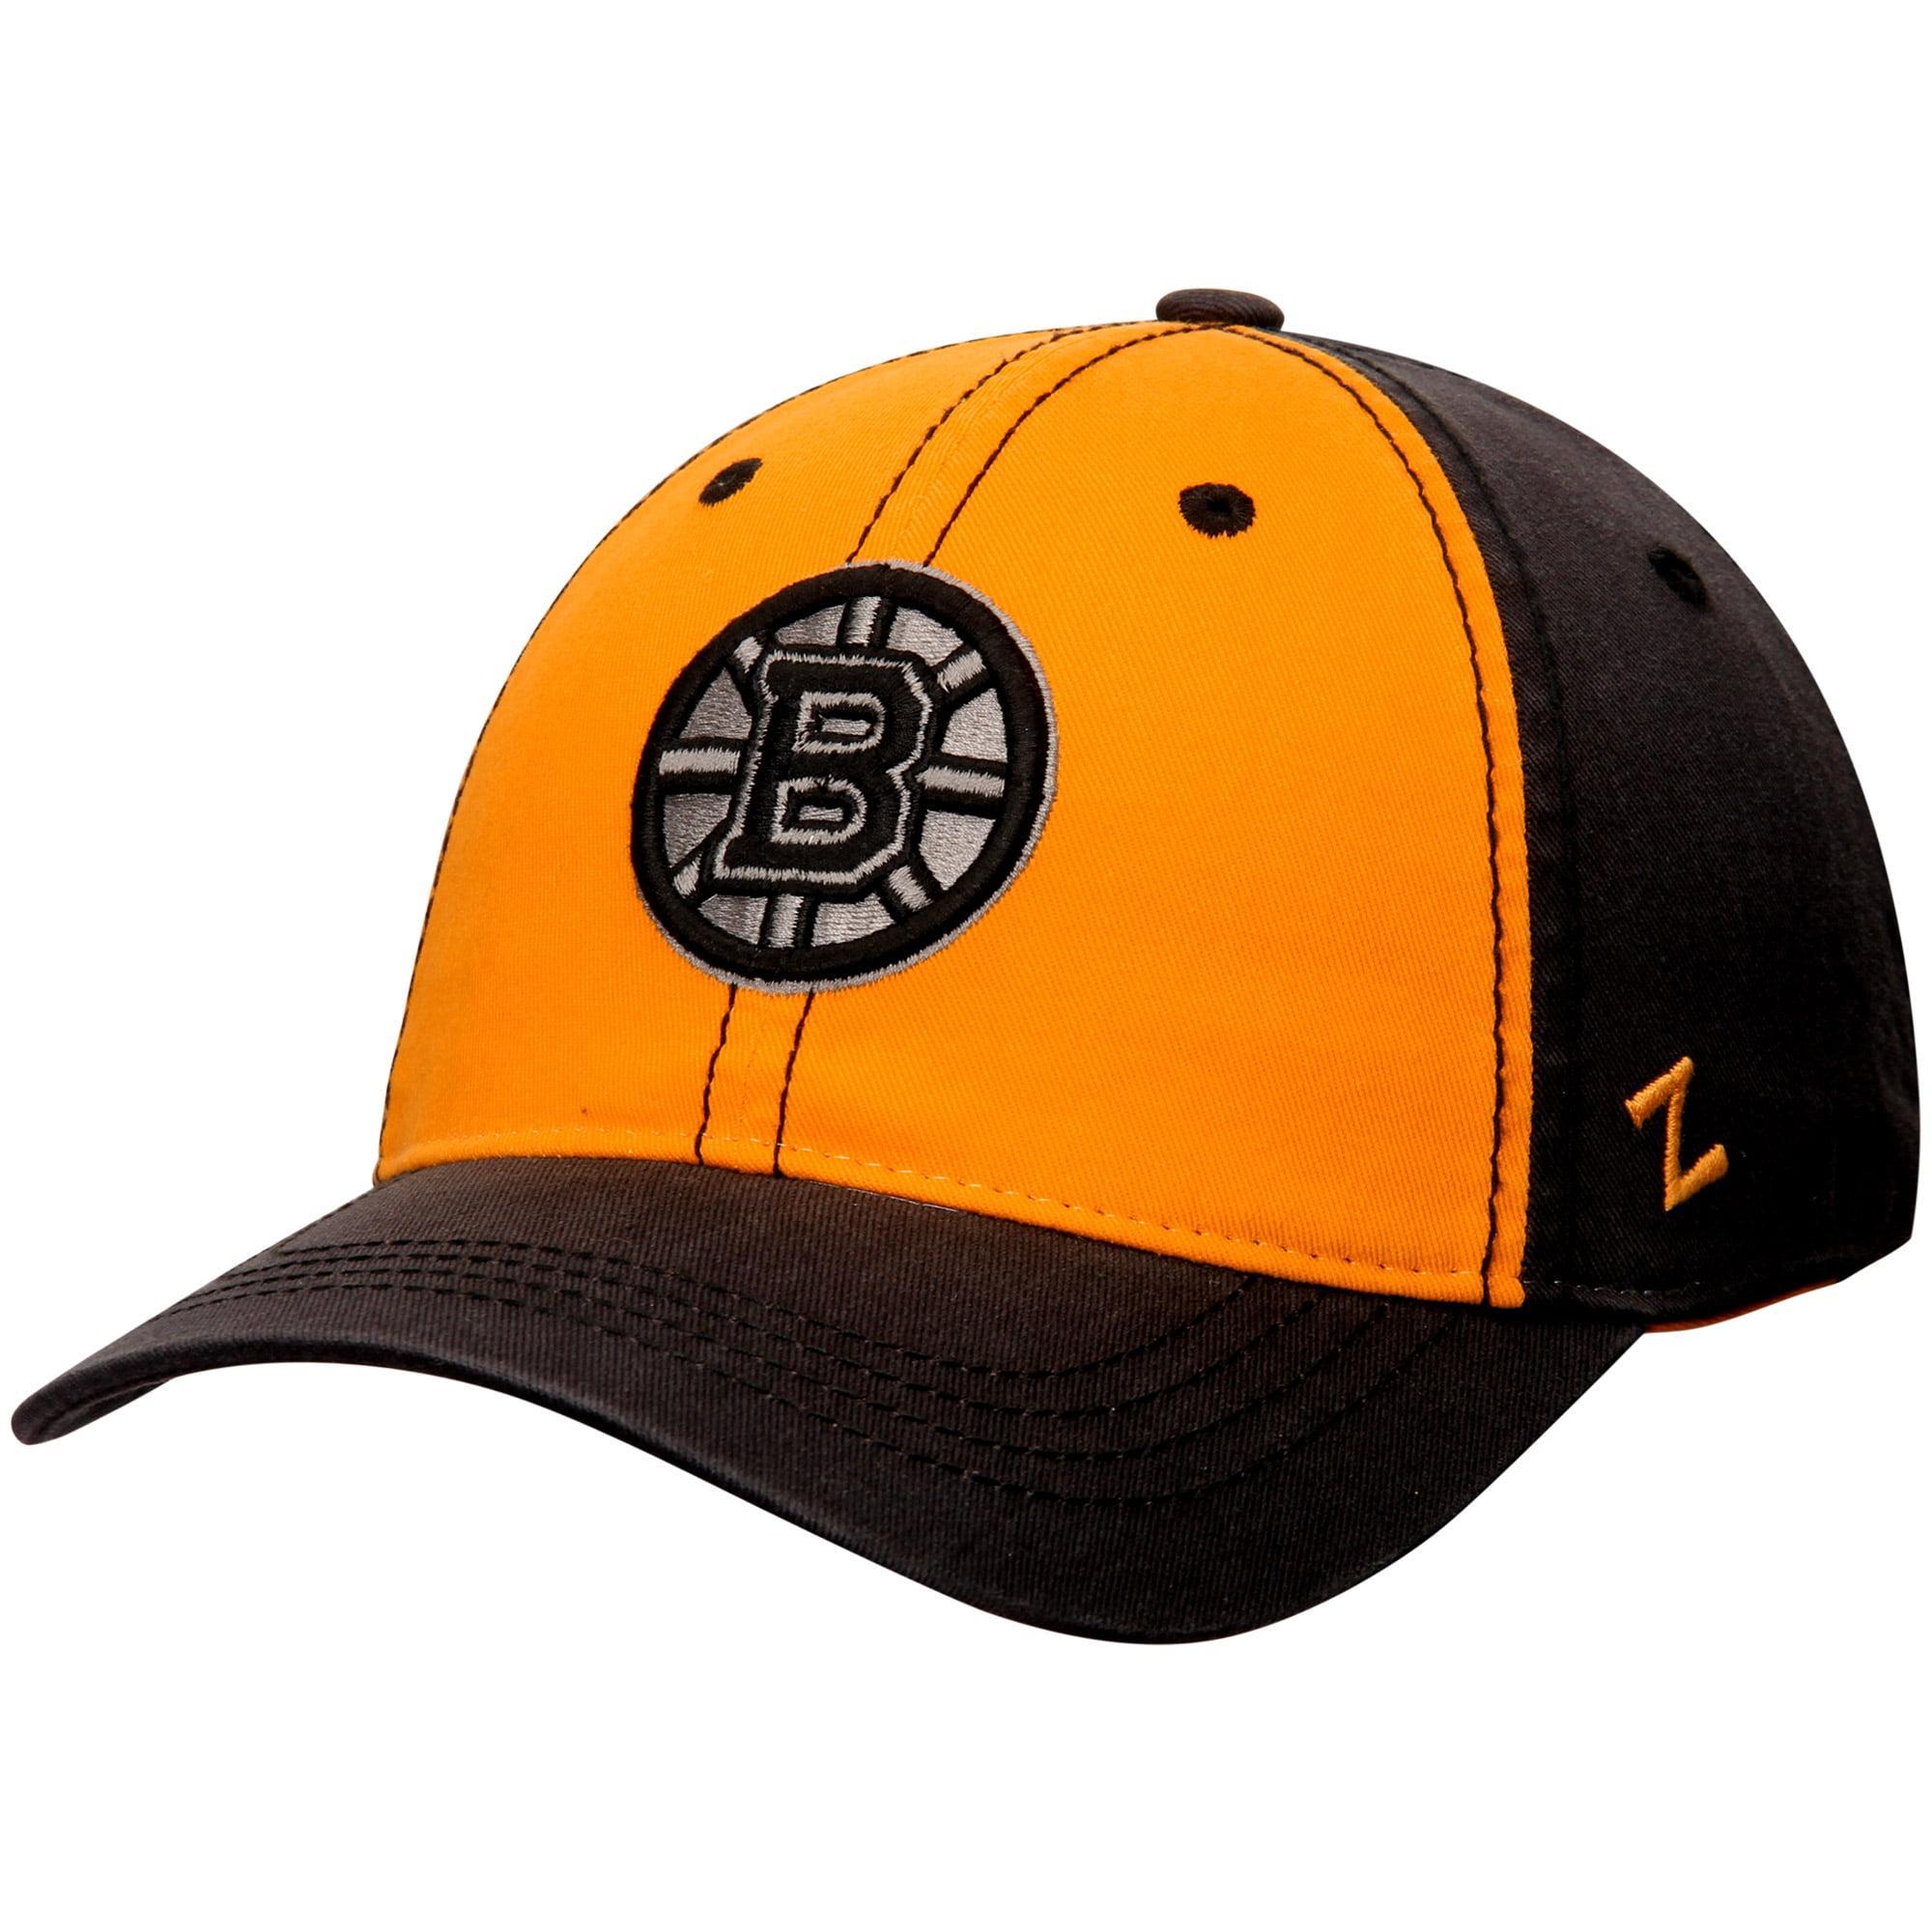 Boston Bruins Zephyr Cobalt Slouch Adjustable Hat - Gold/Charcoal - OSFA